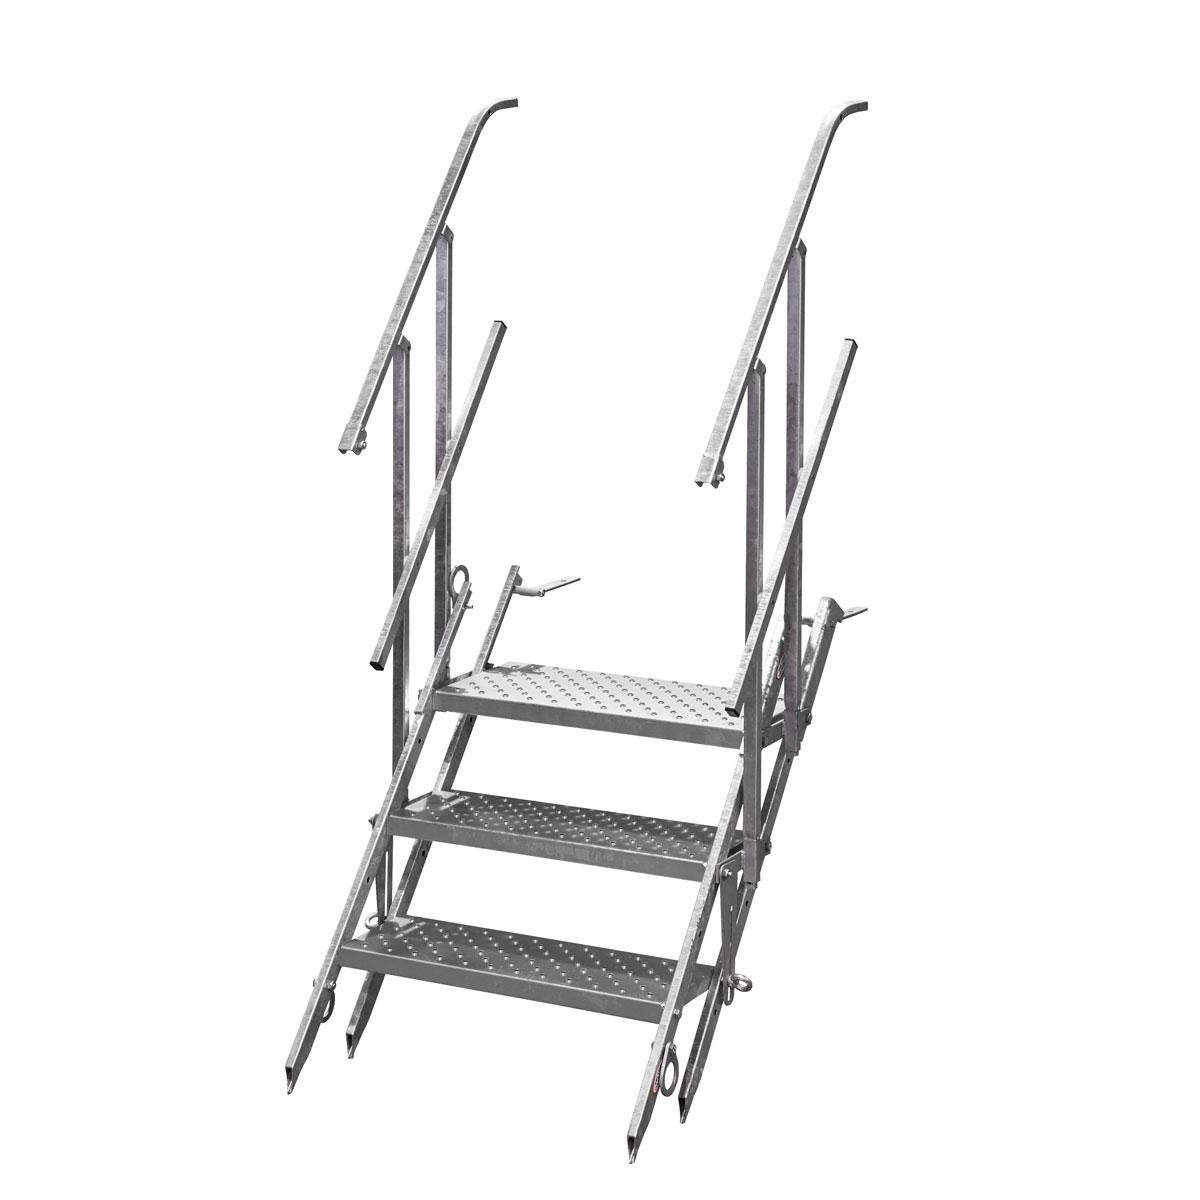 Escaliers Largeur 70 Cm Null Securite Anti Chute